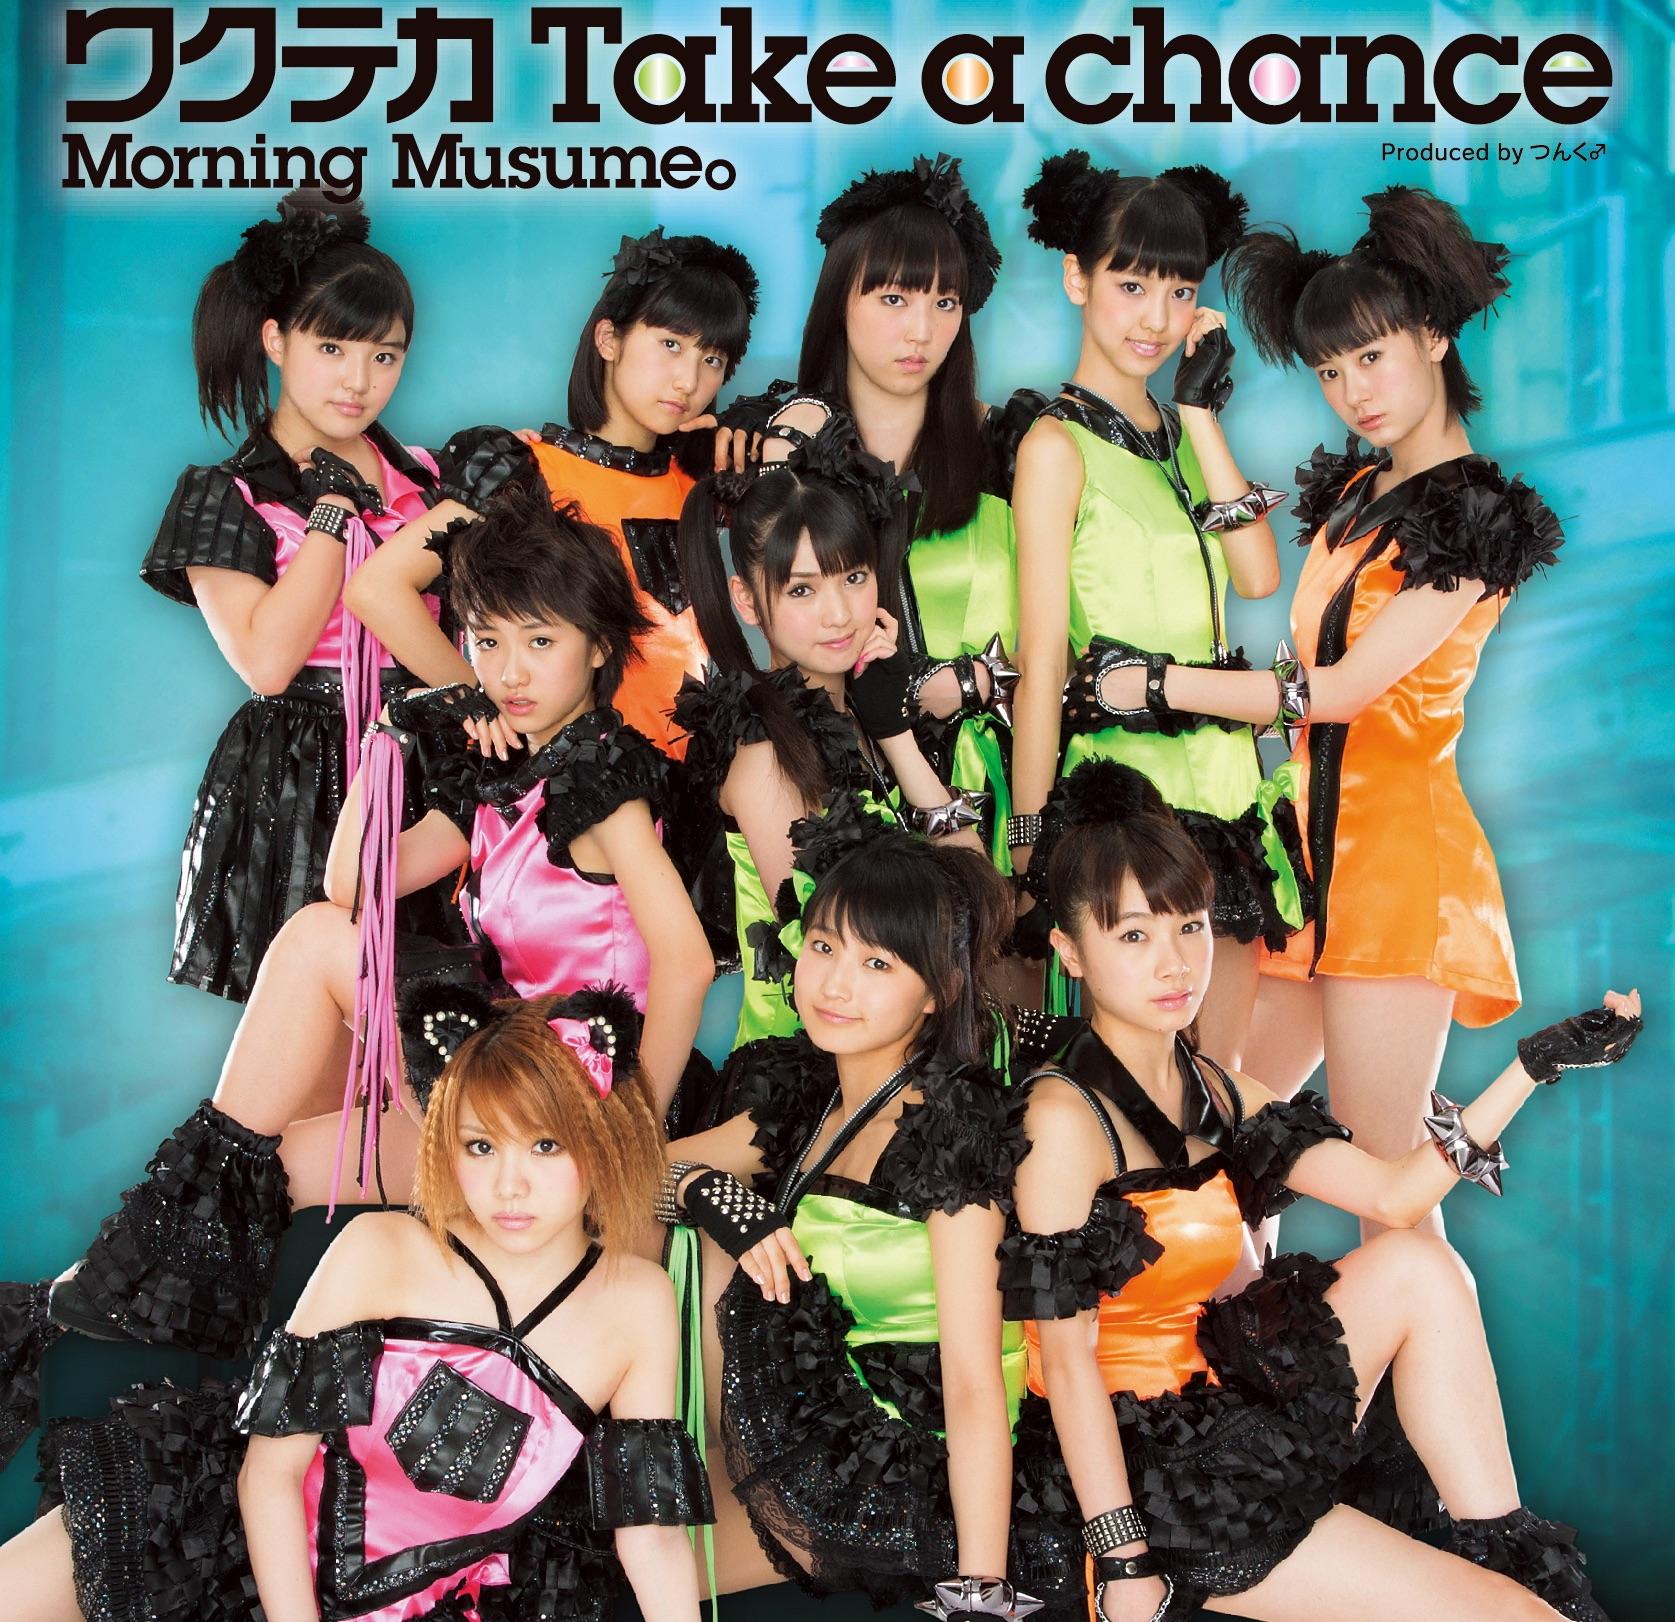 File:WakutekaTakeachance-r.jpg